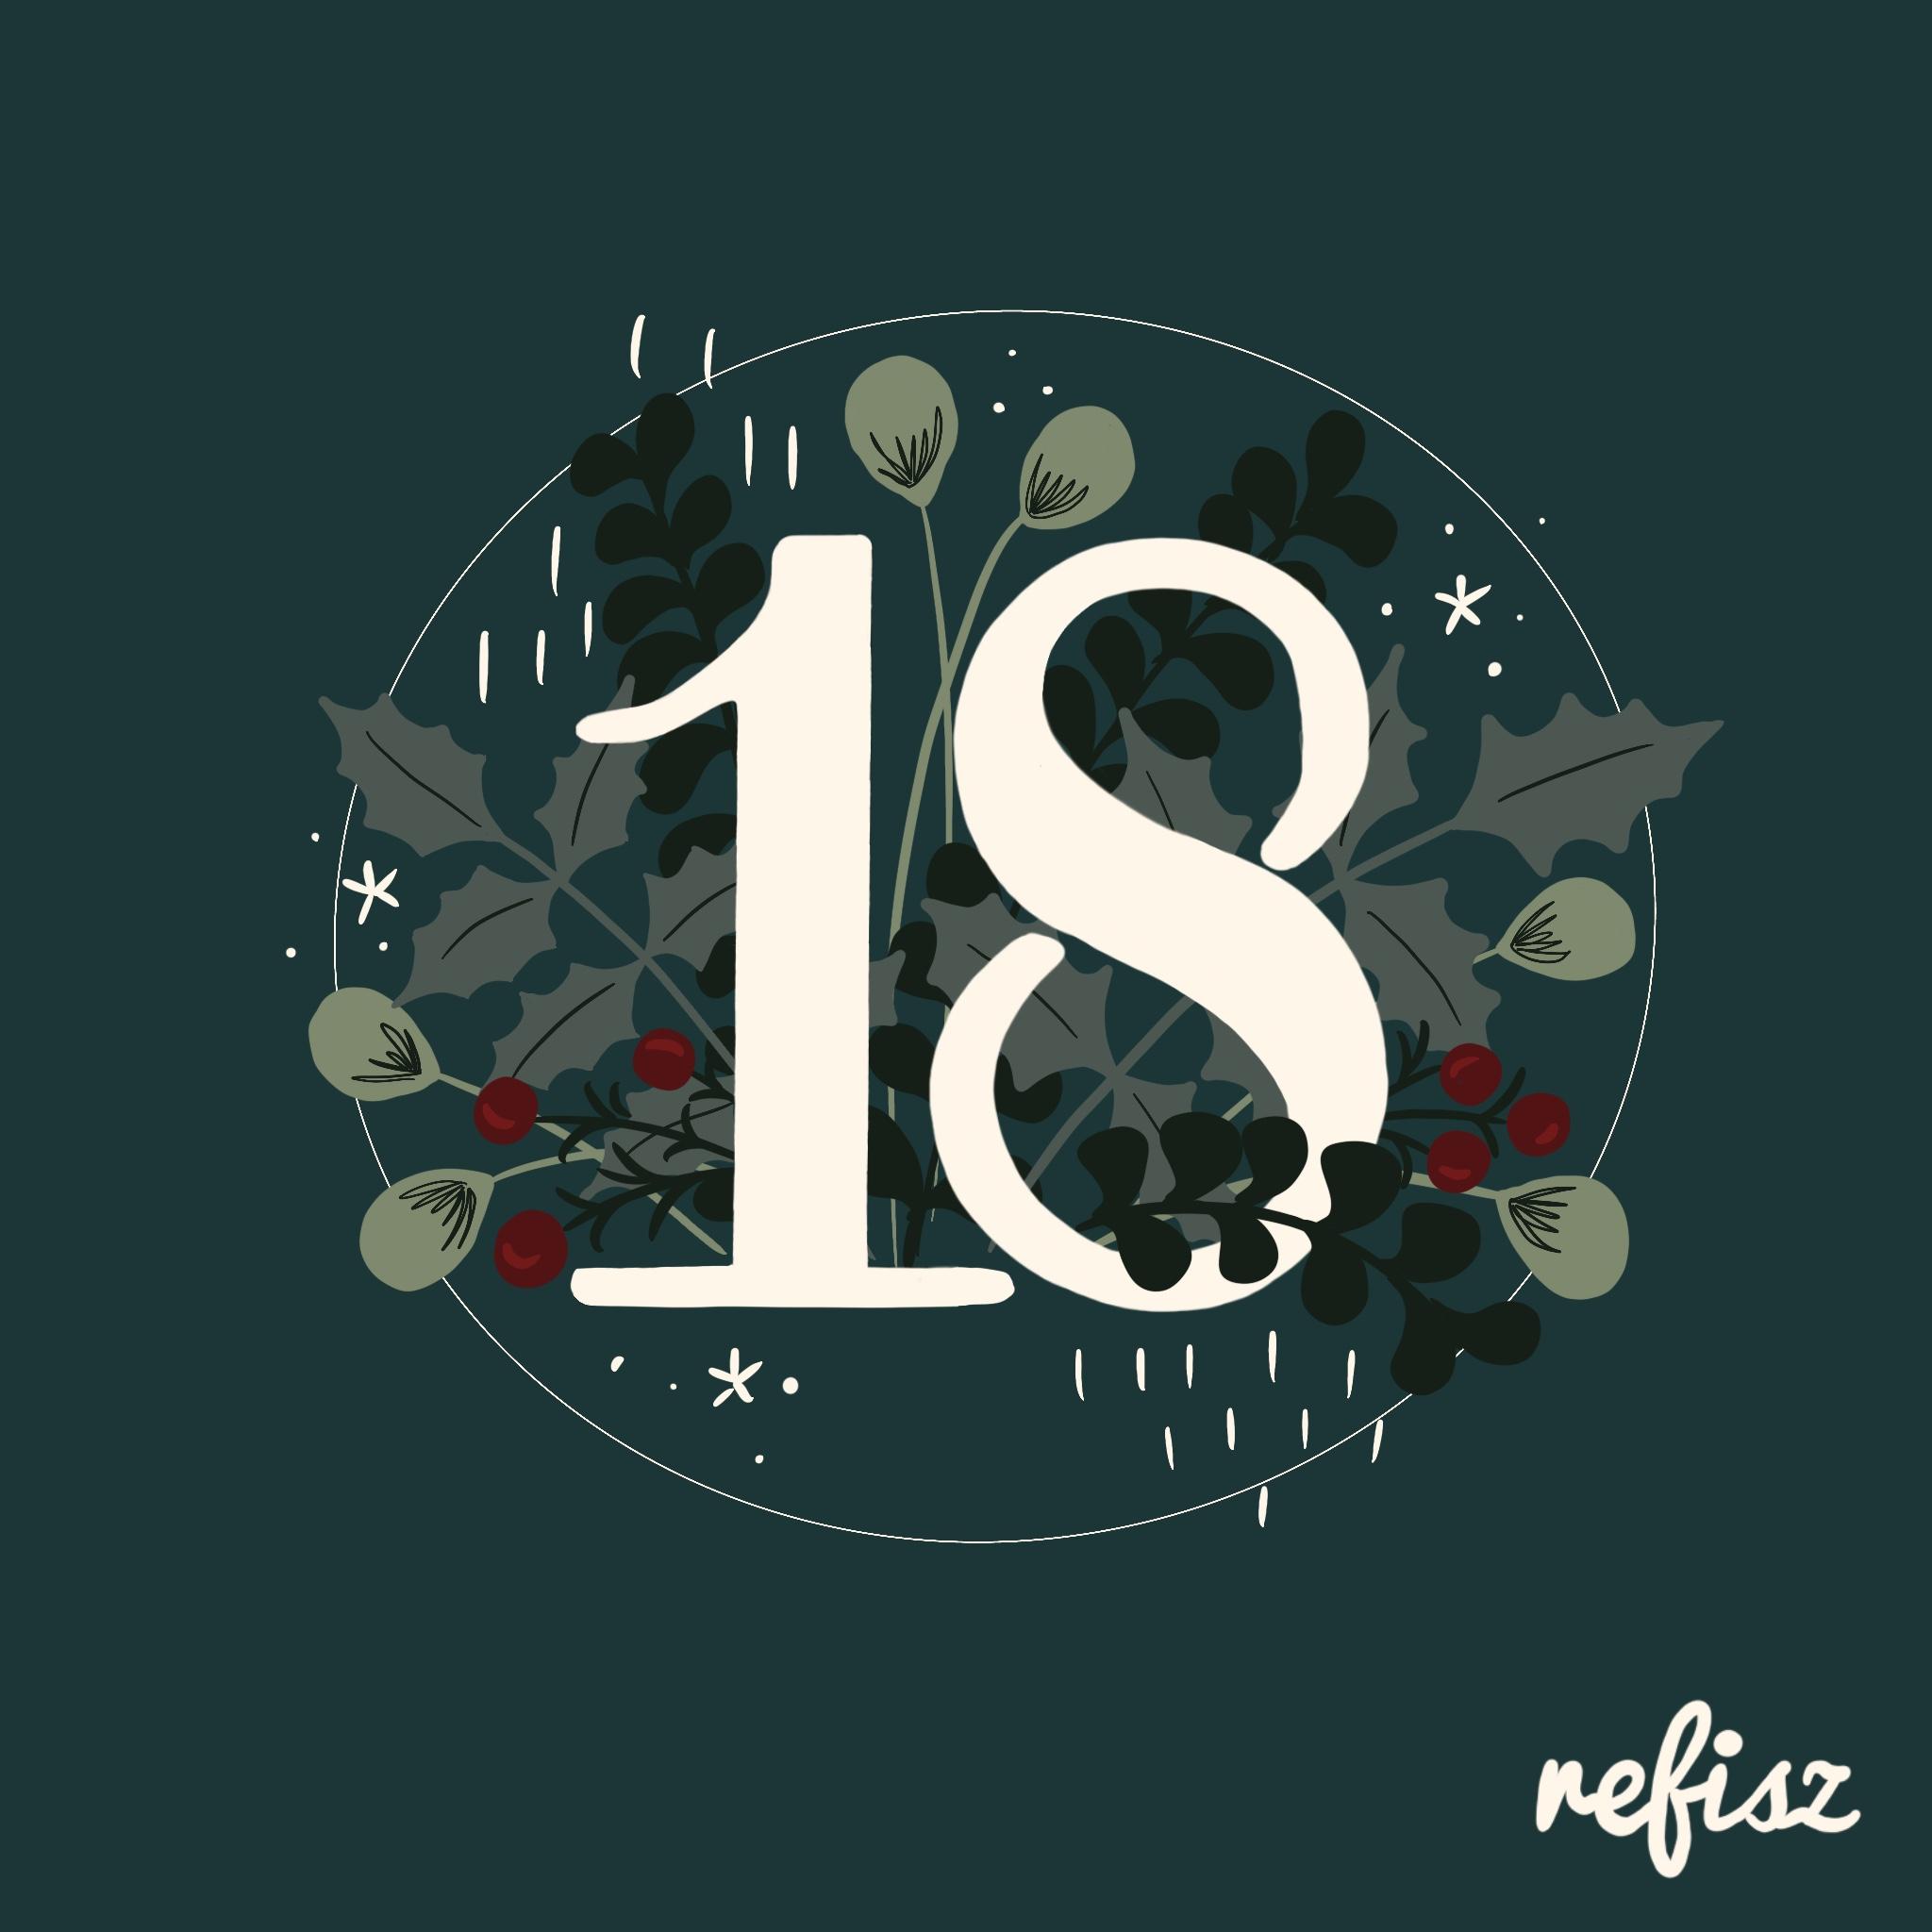 REFISZ Adventi Kalendárium 2020. december 18.